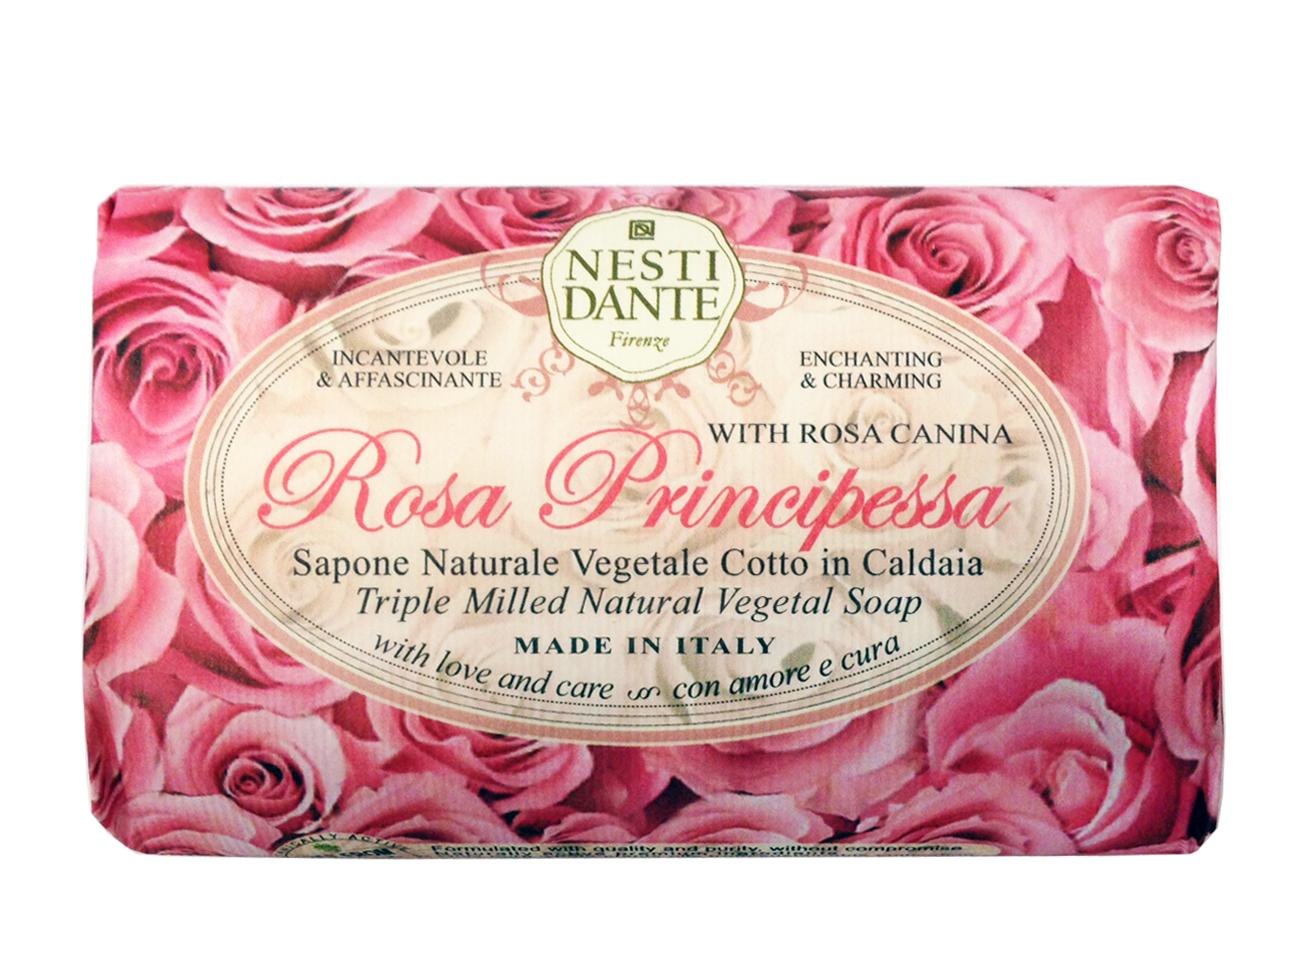 ROSA PRINCIPESSA front.JPG